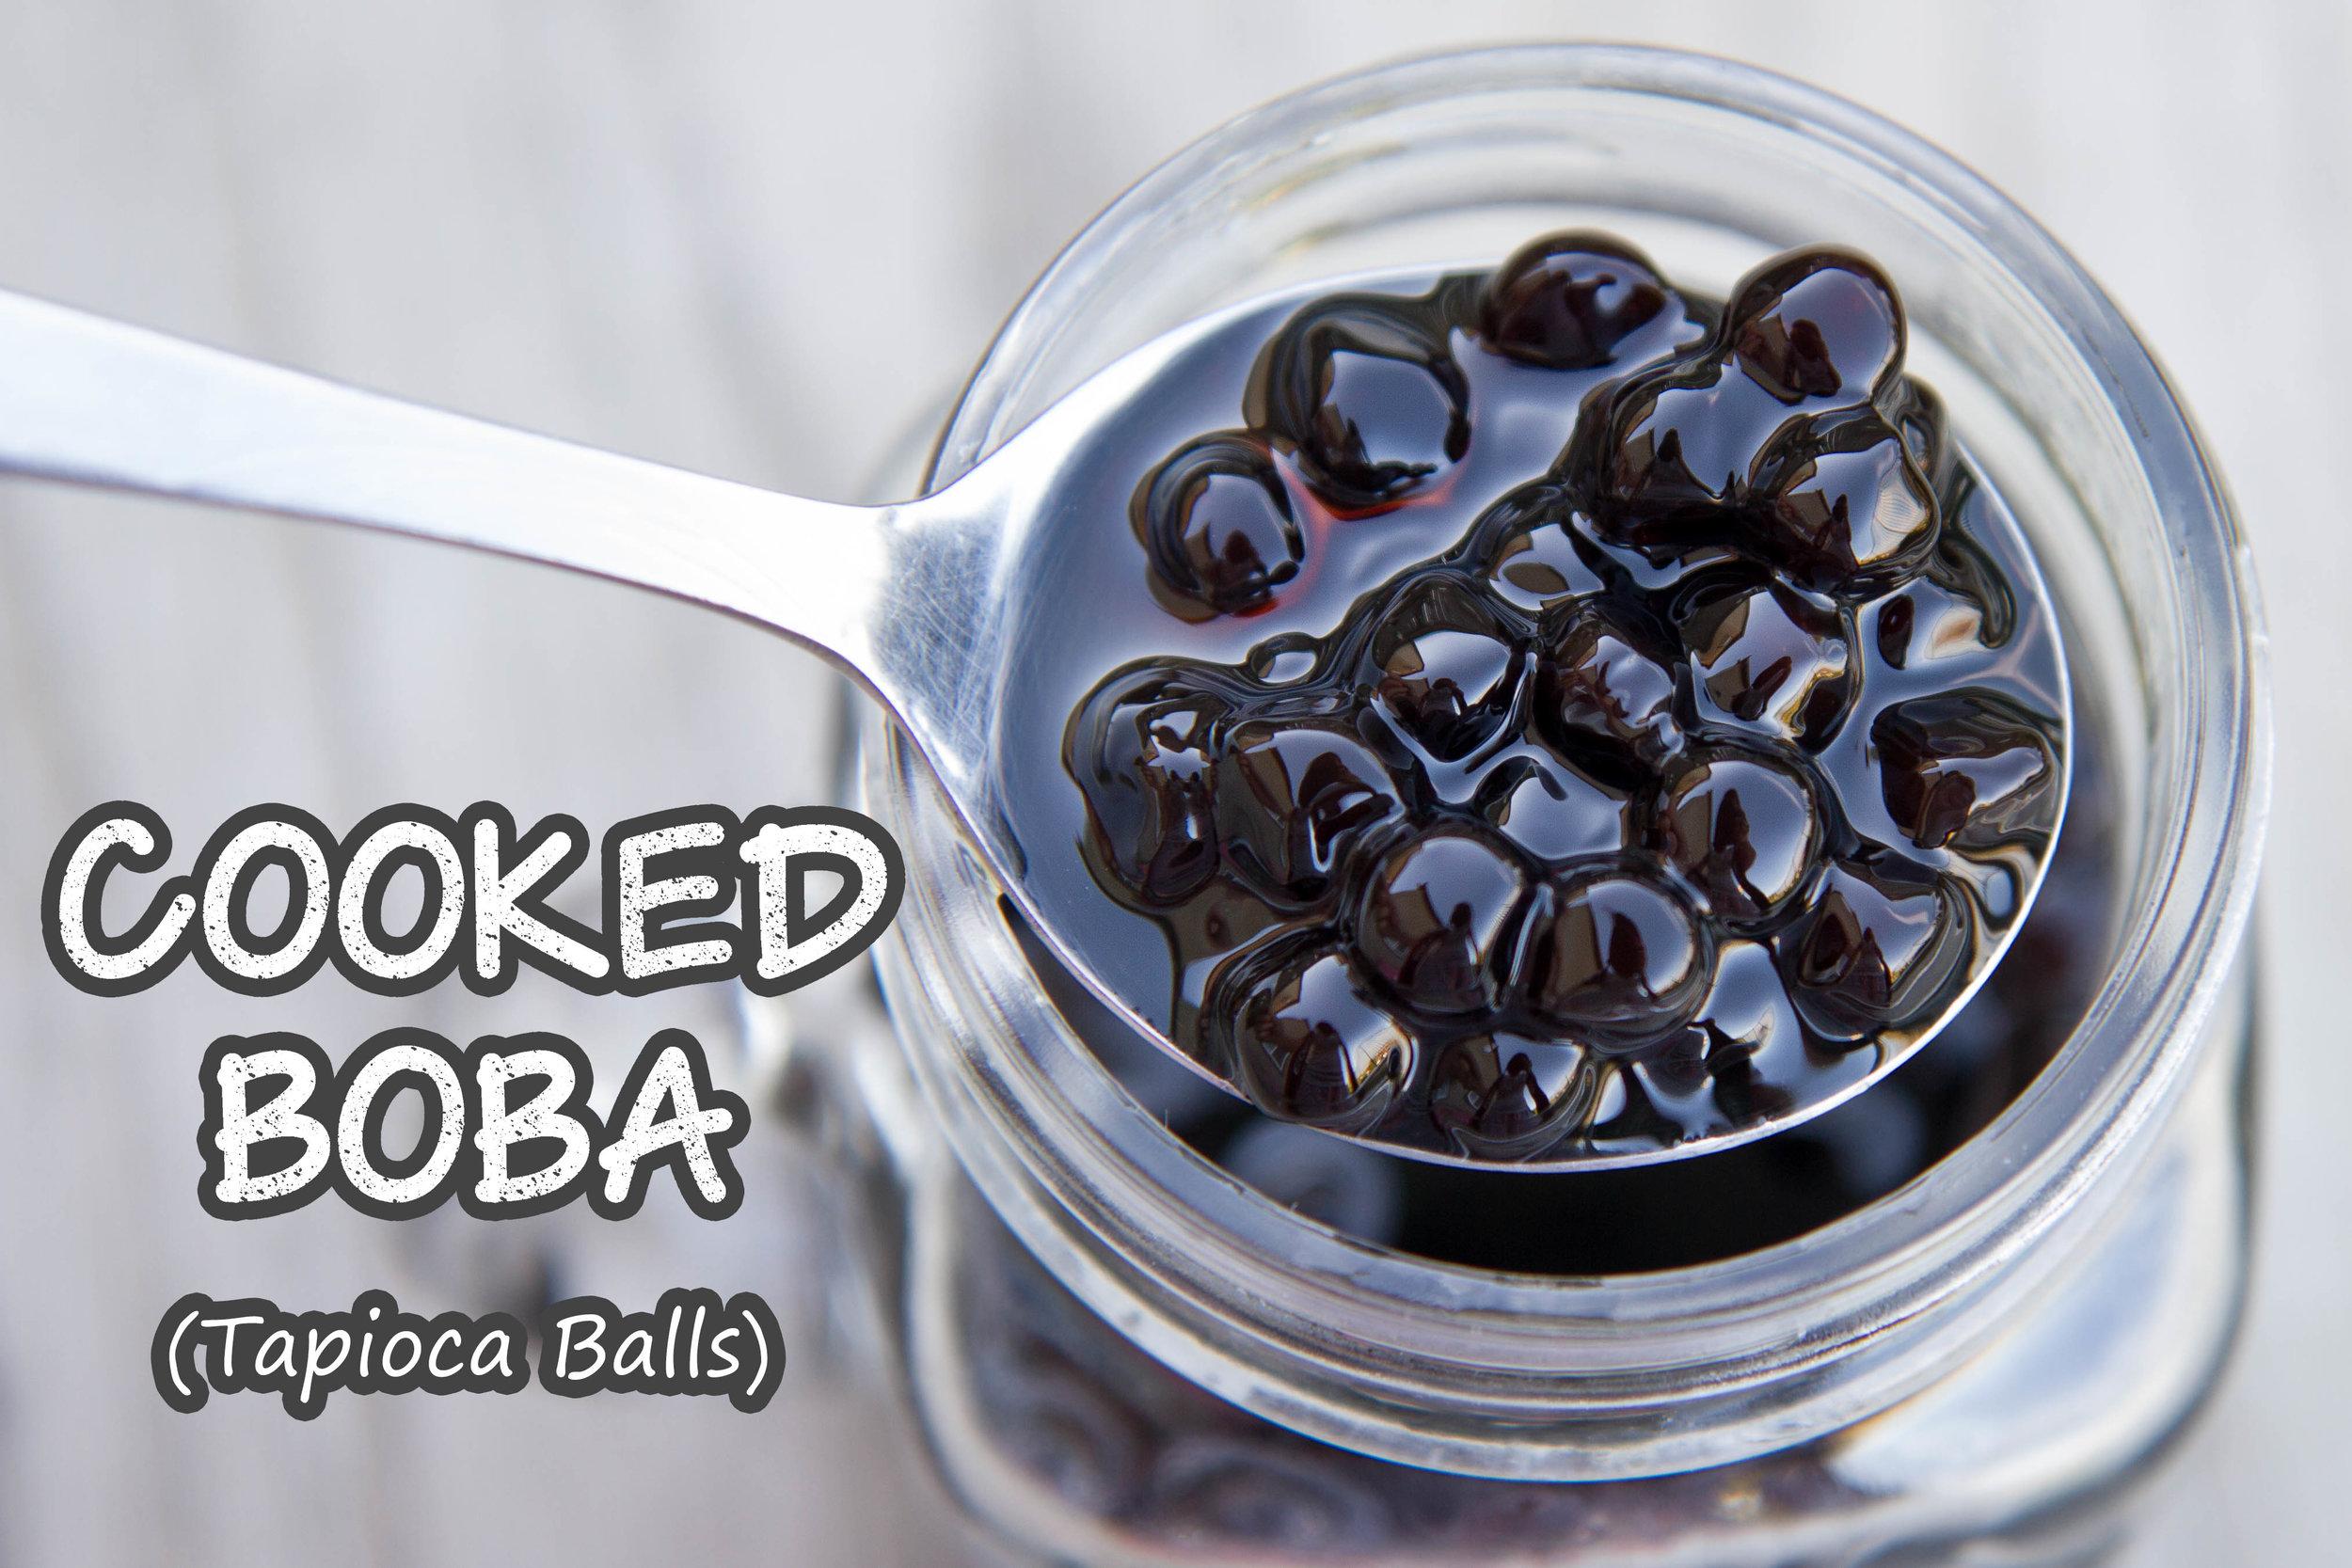 Cooked Tapioca Balls (Boba)